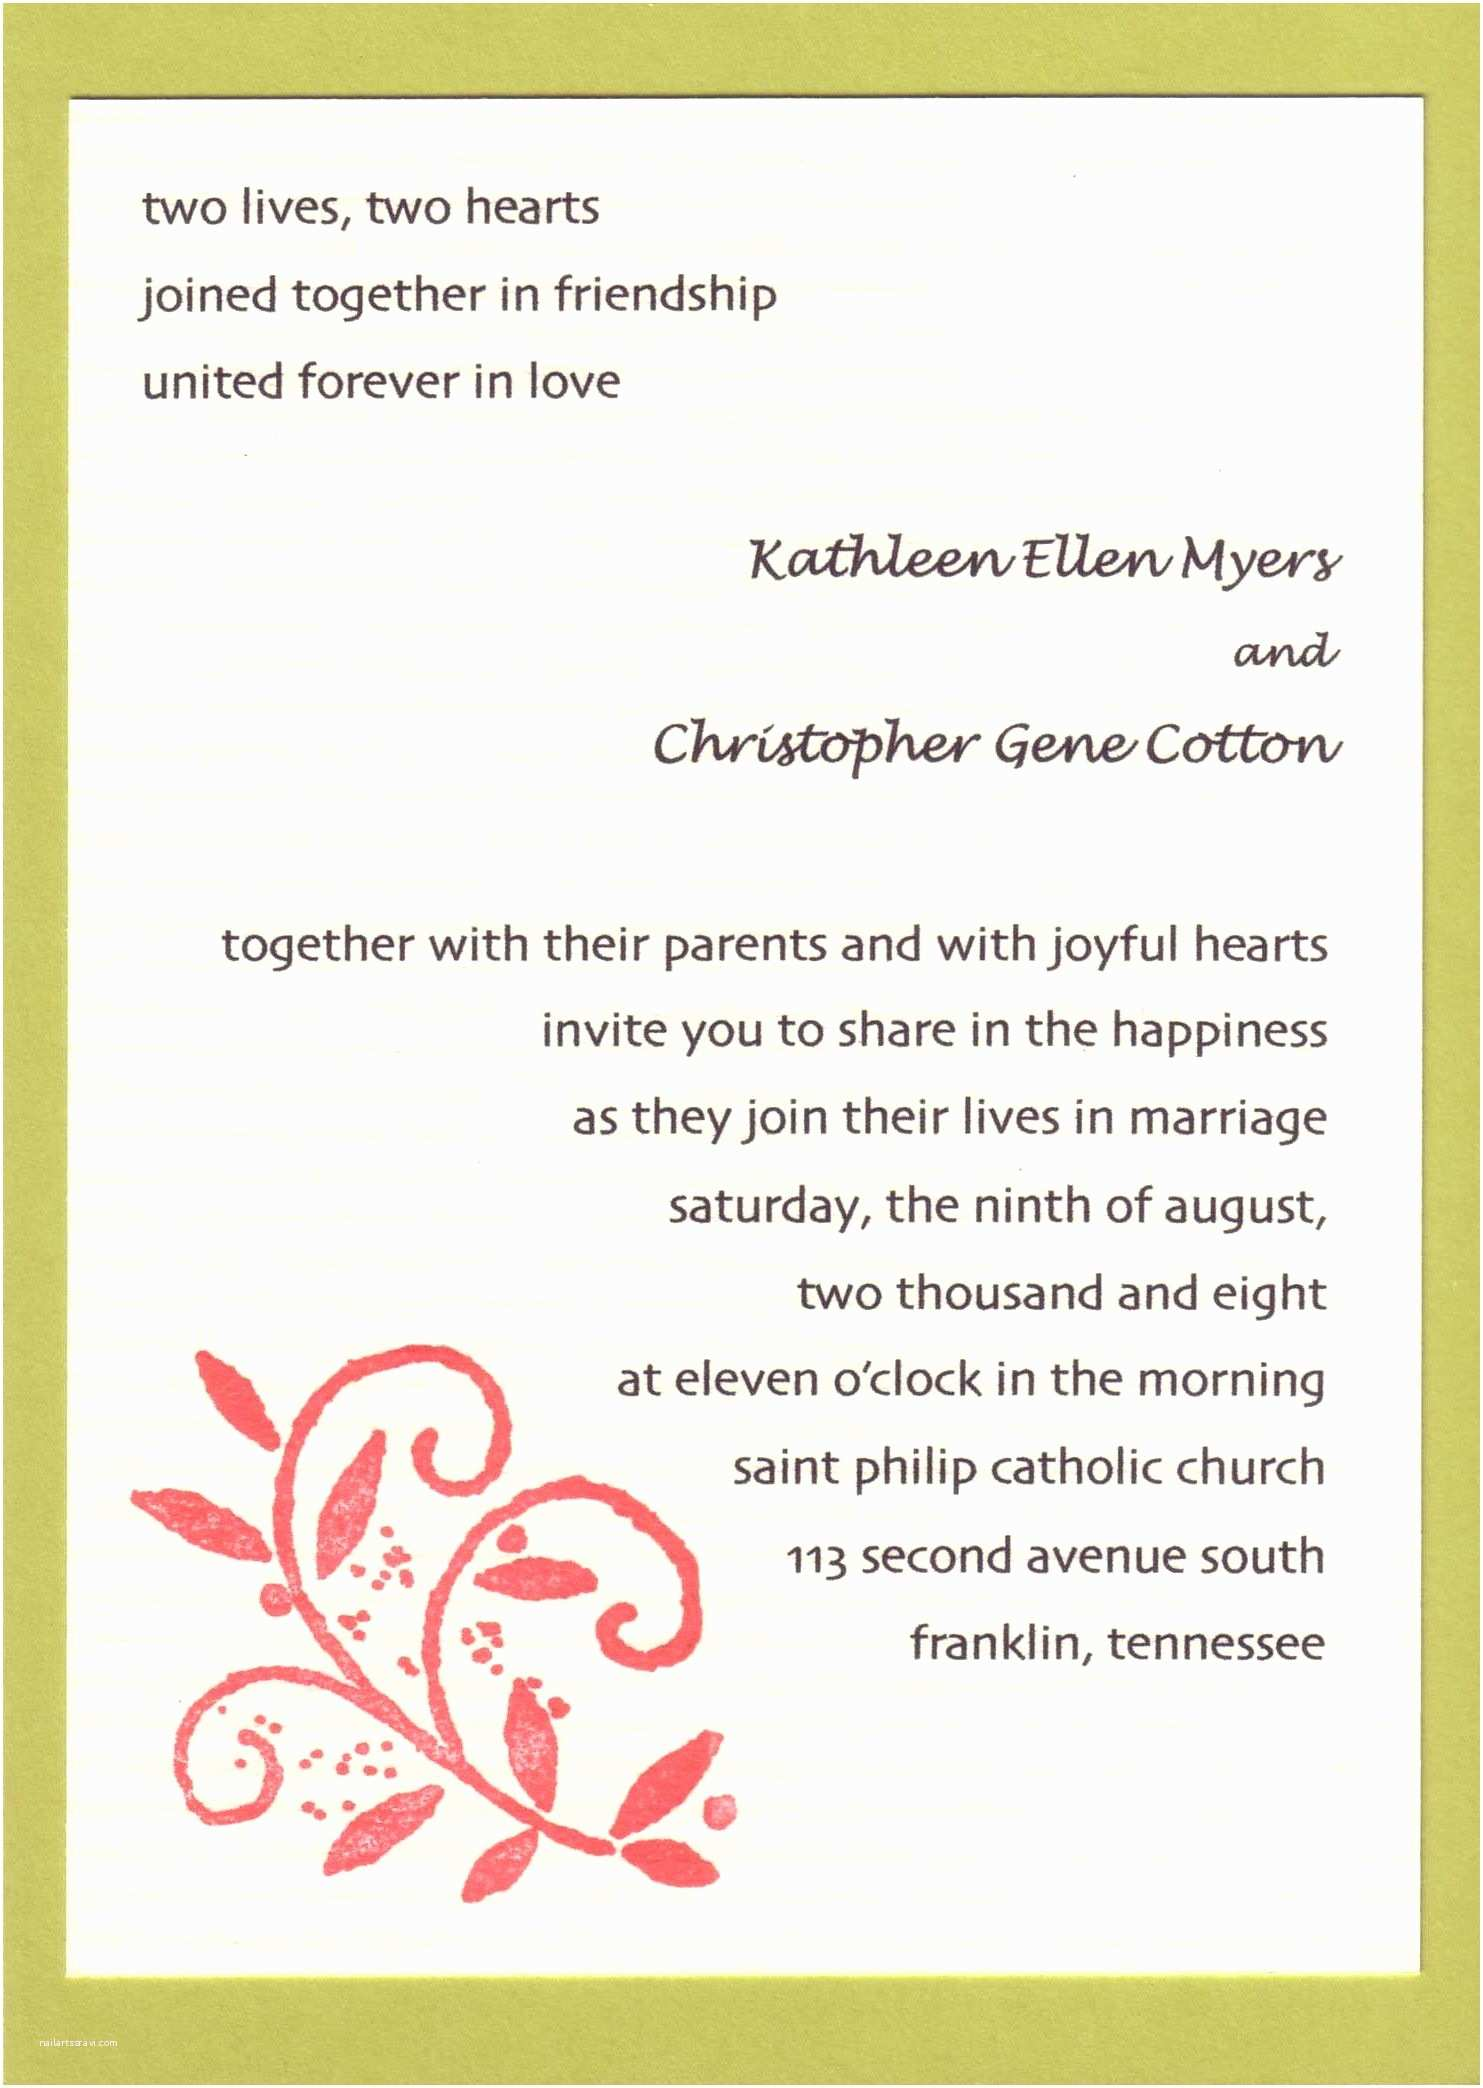 Wedding Invitation Verbiage Wedding Invitations Cards Wording Wedding Invitation